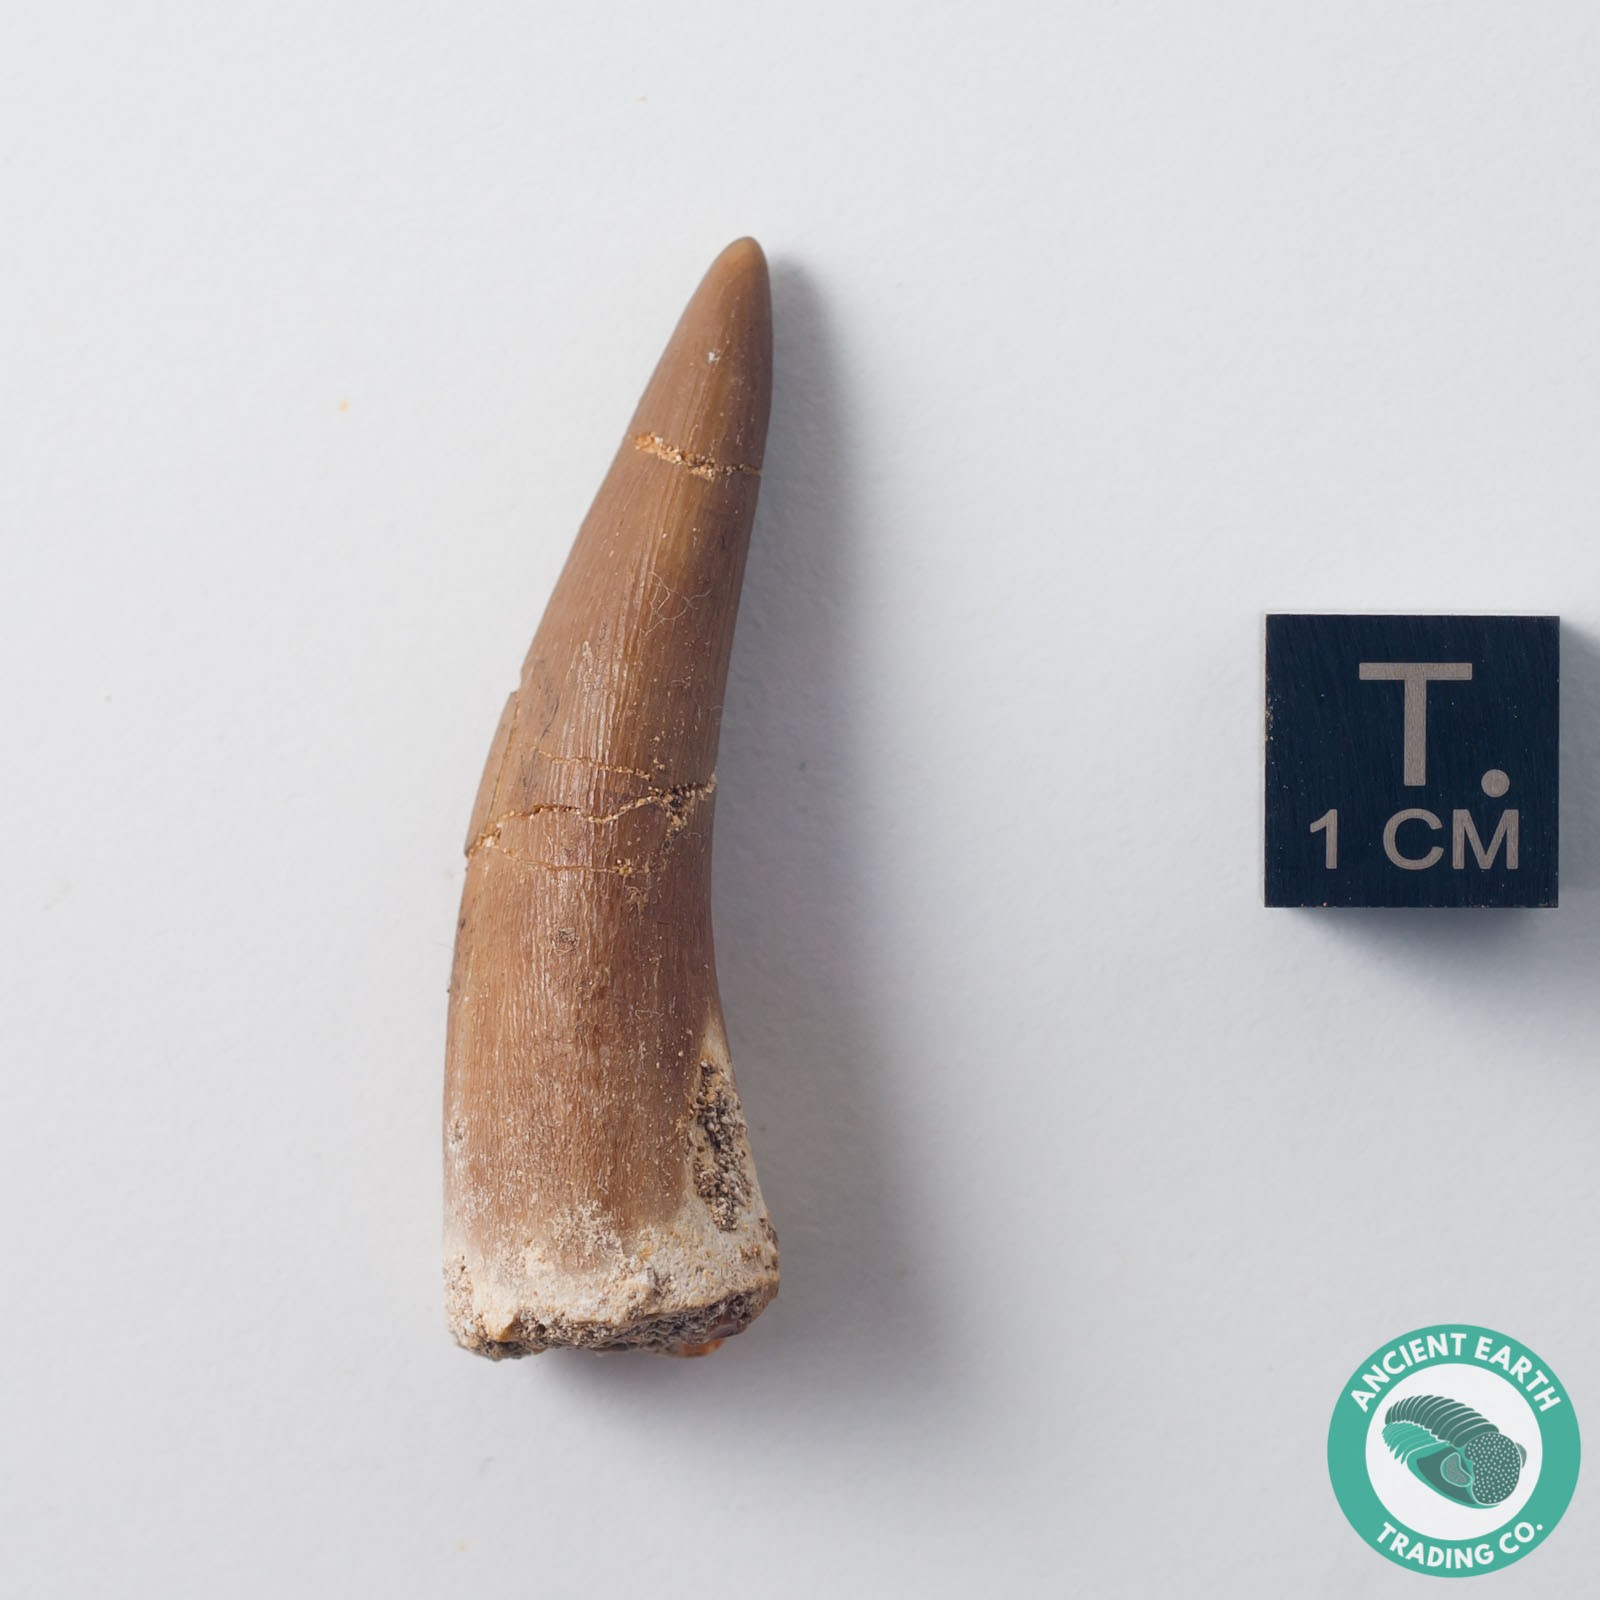 1.57 in. Plesiosaur Zarafasaura Fossil Tooth - Morocco